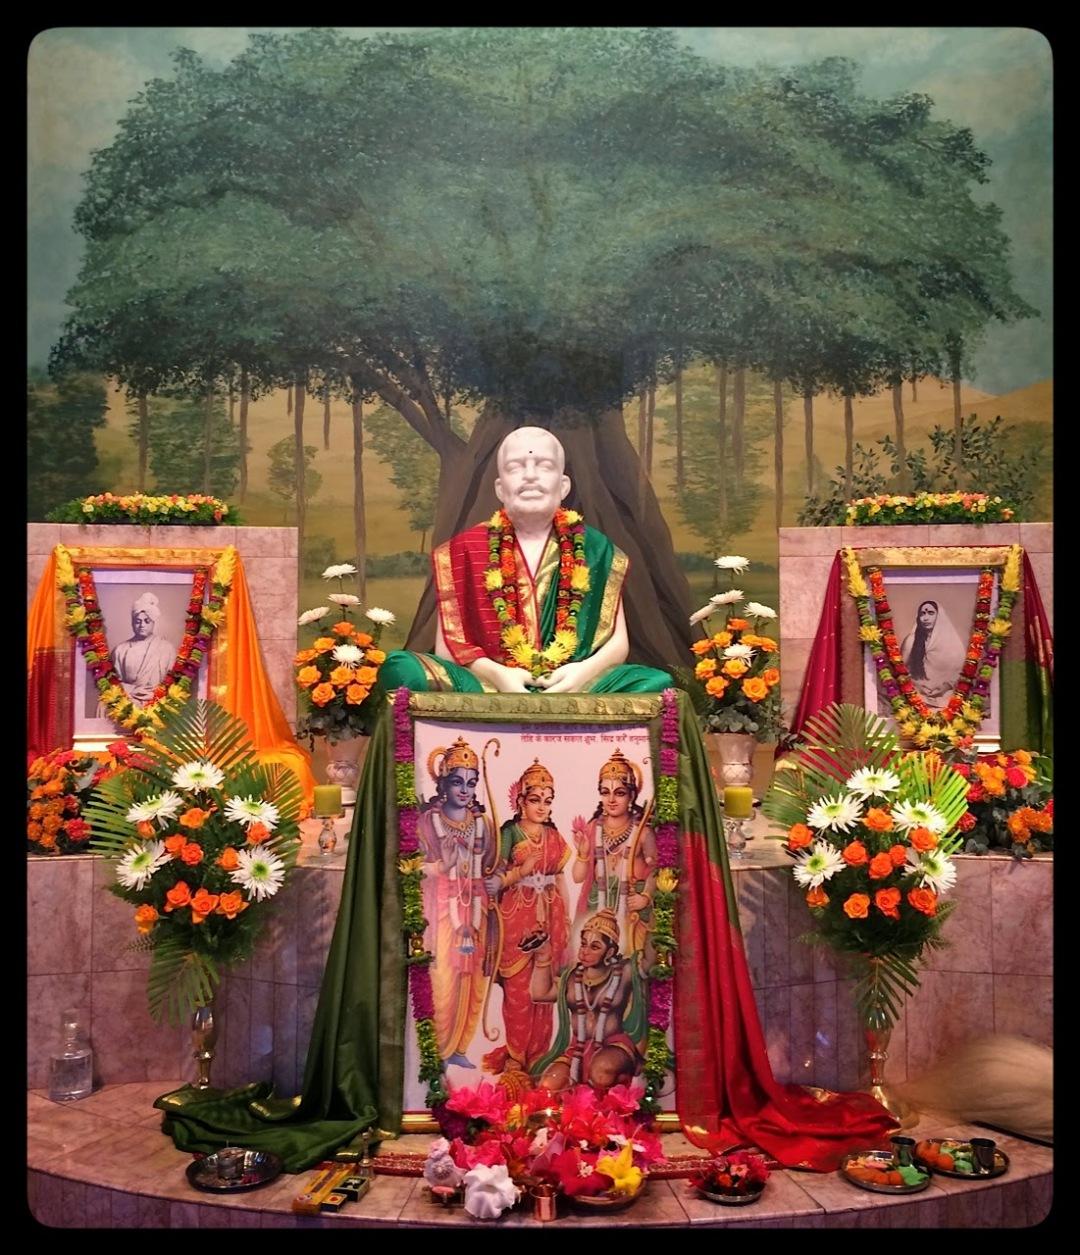 Sri Ramakrishna altar with picture of Sri Sita, Ram, Lakshmana and Hanuman